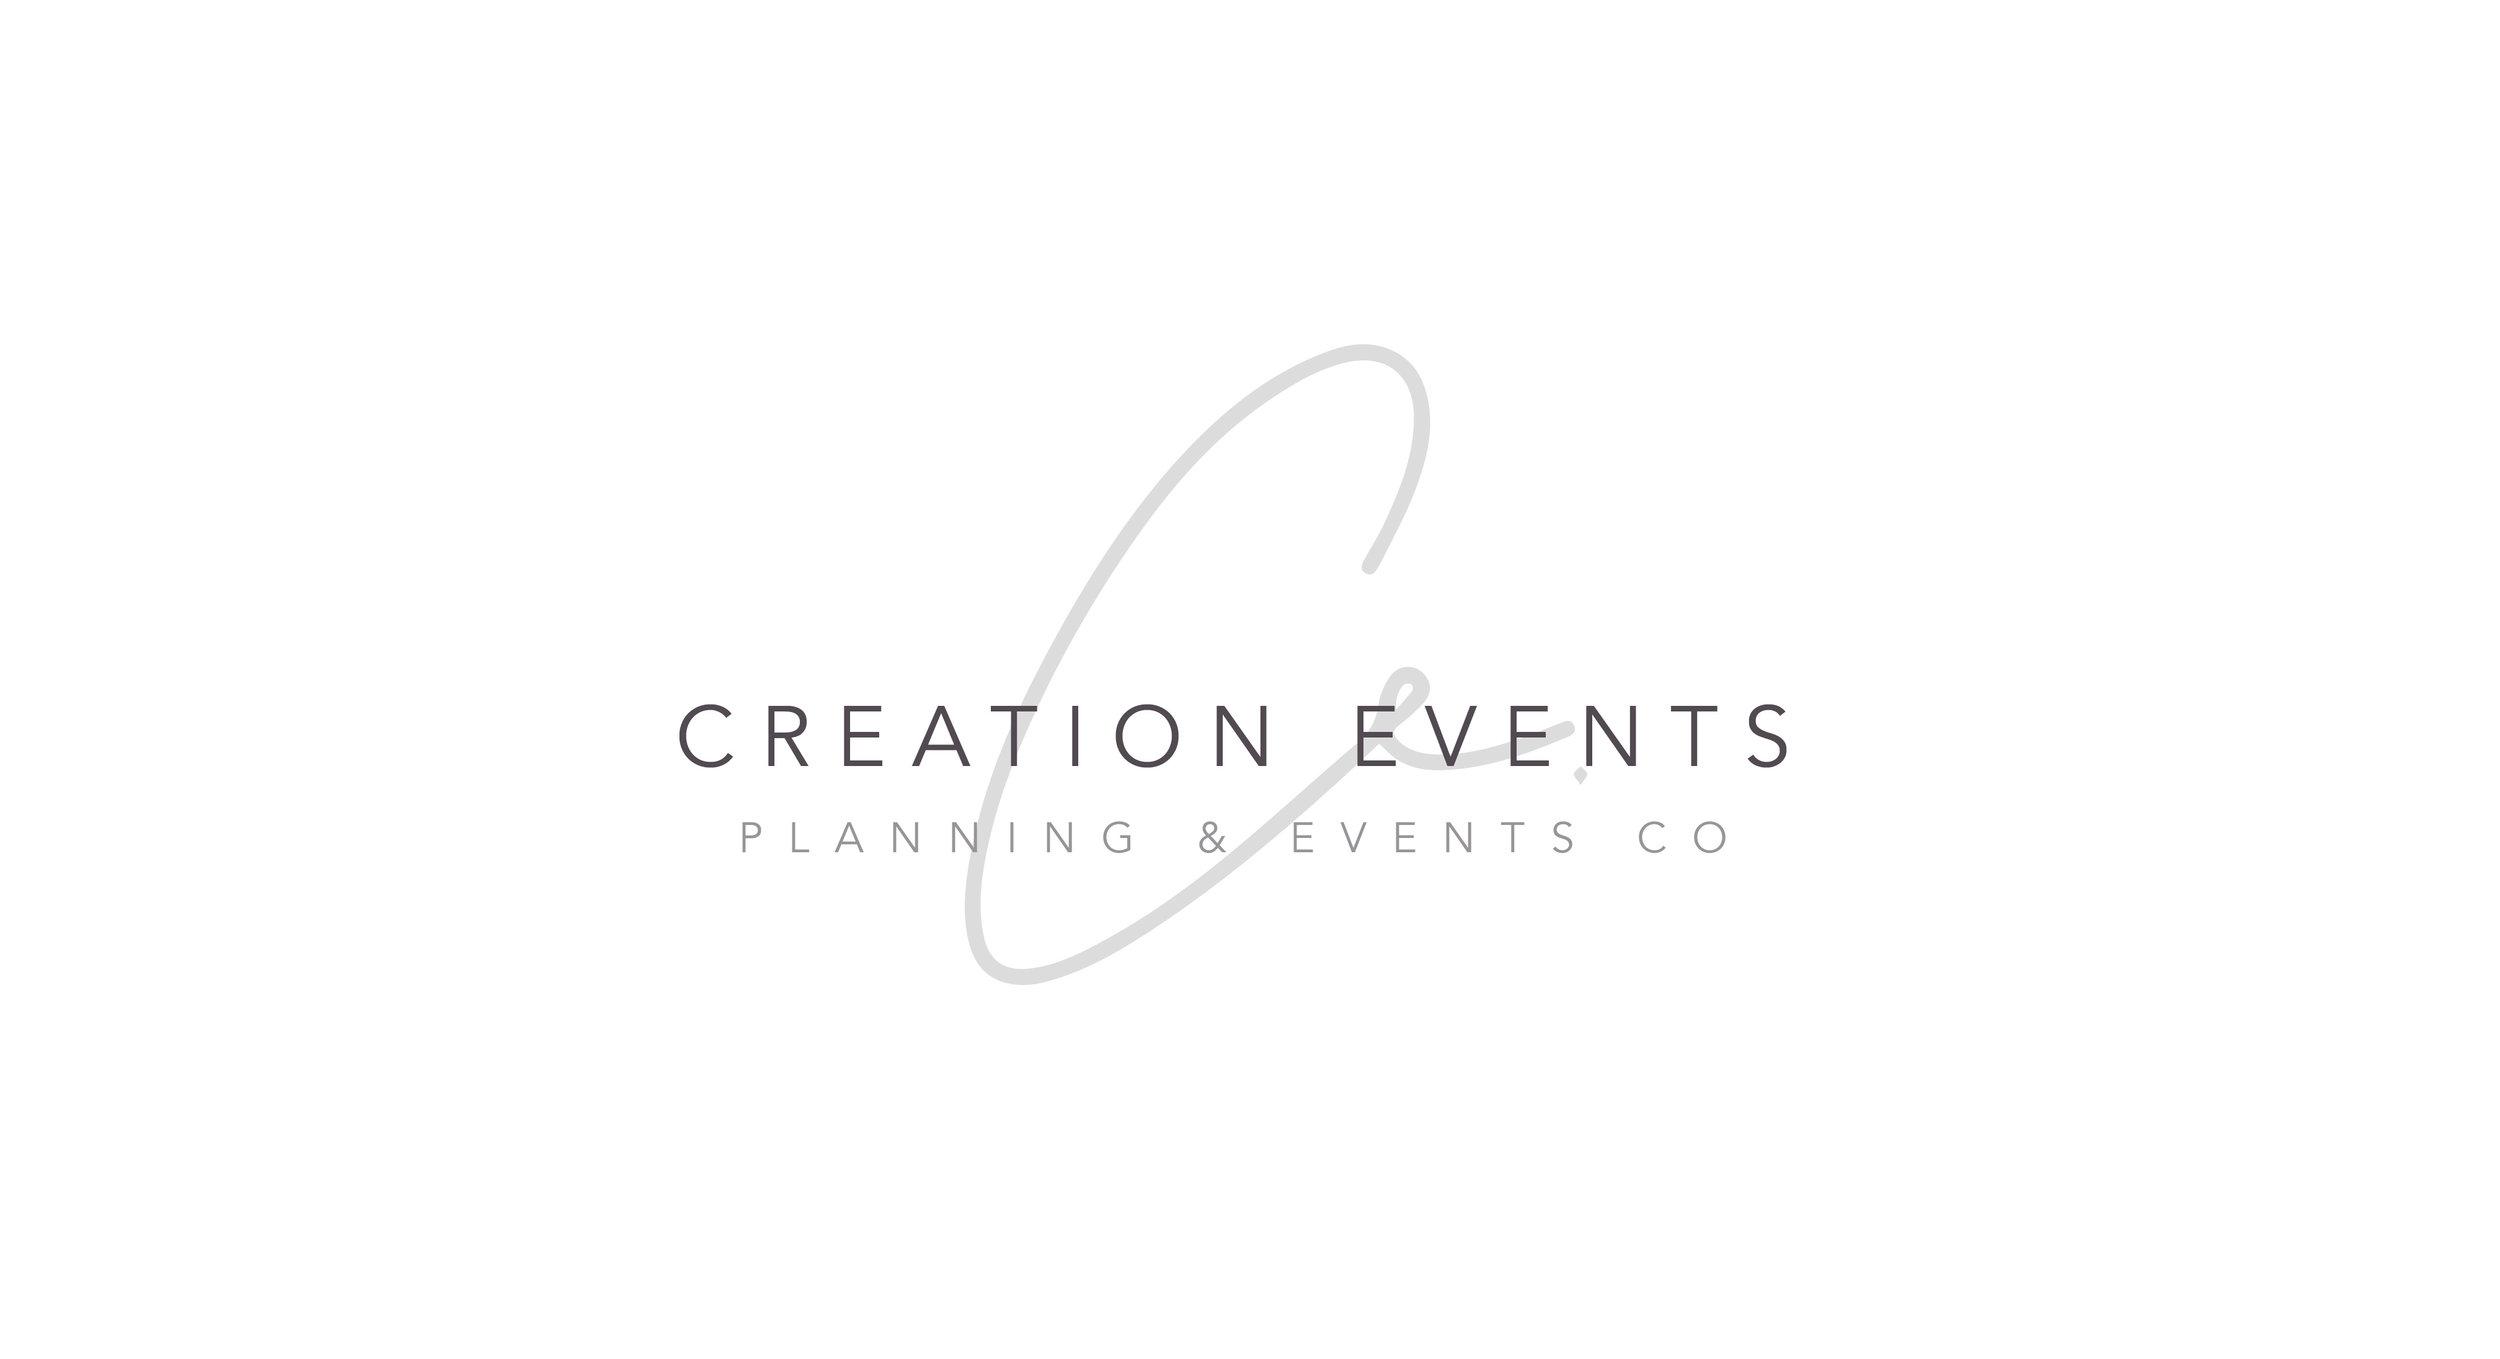 Creation Events Wedding Planner New Logo.jpg